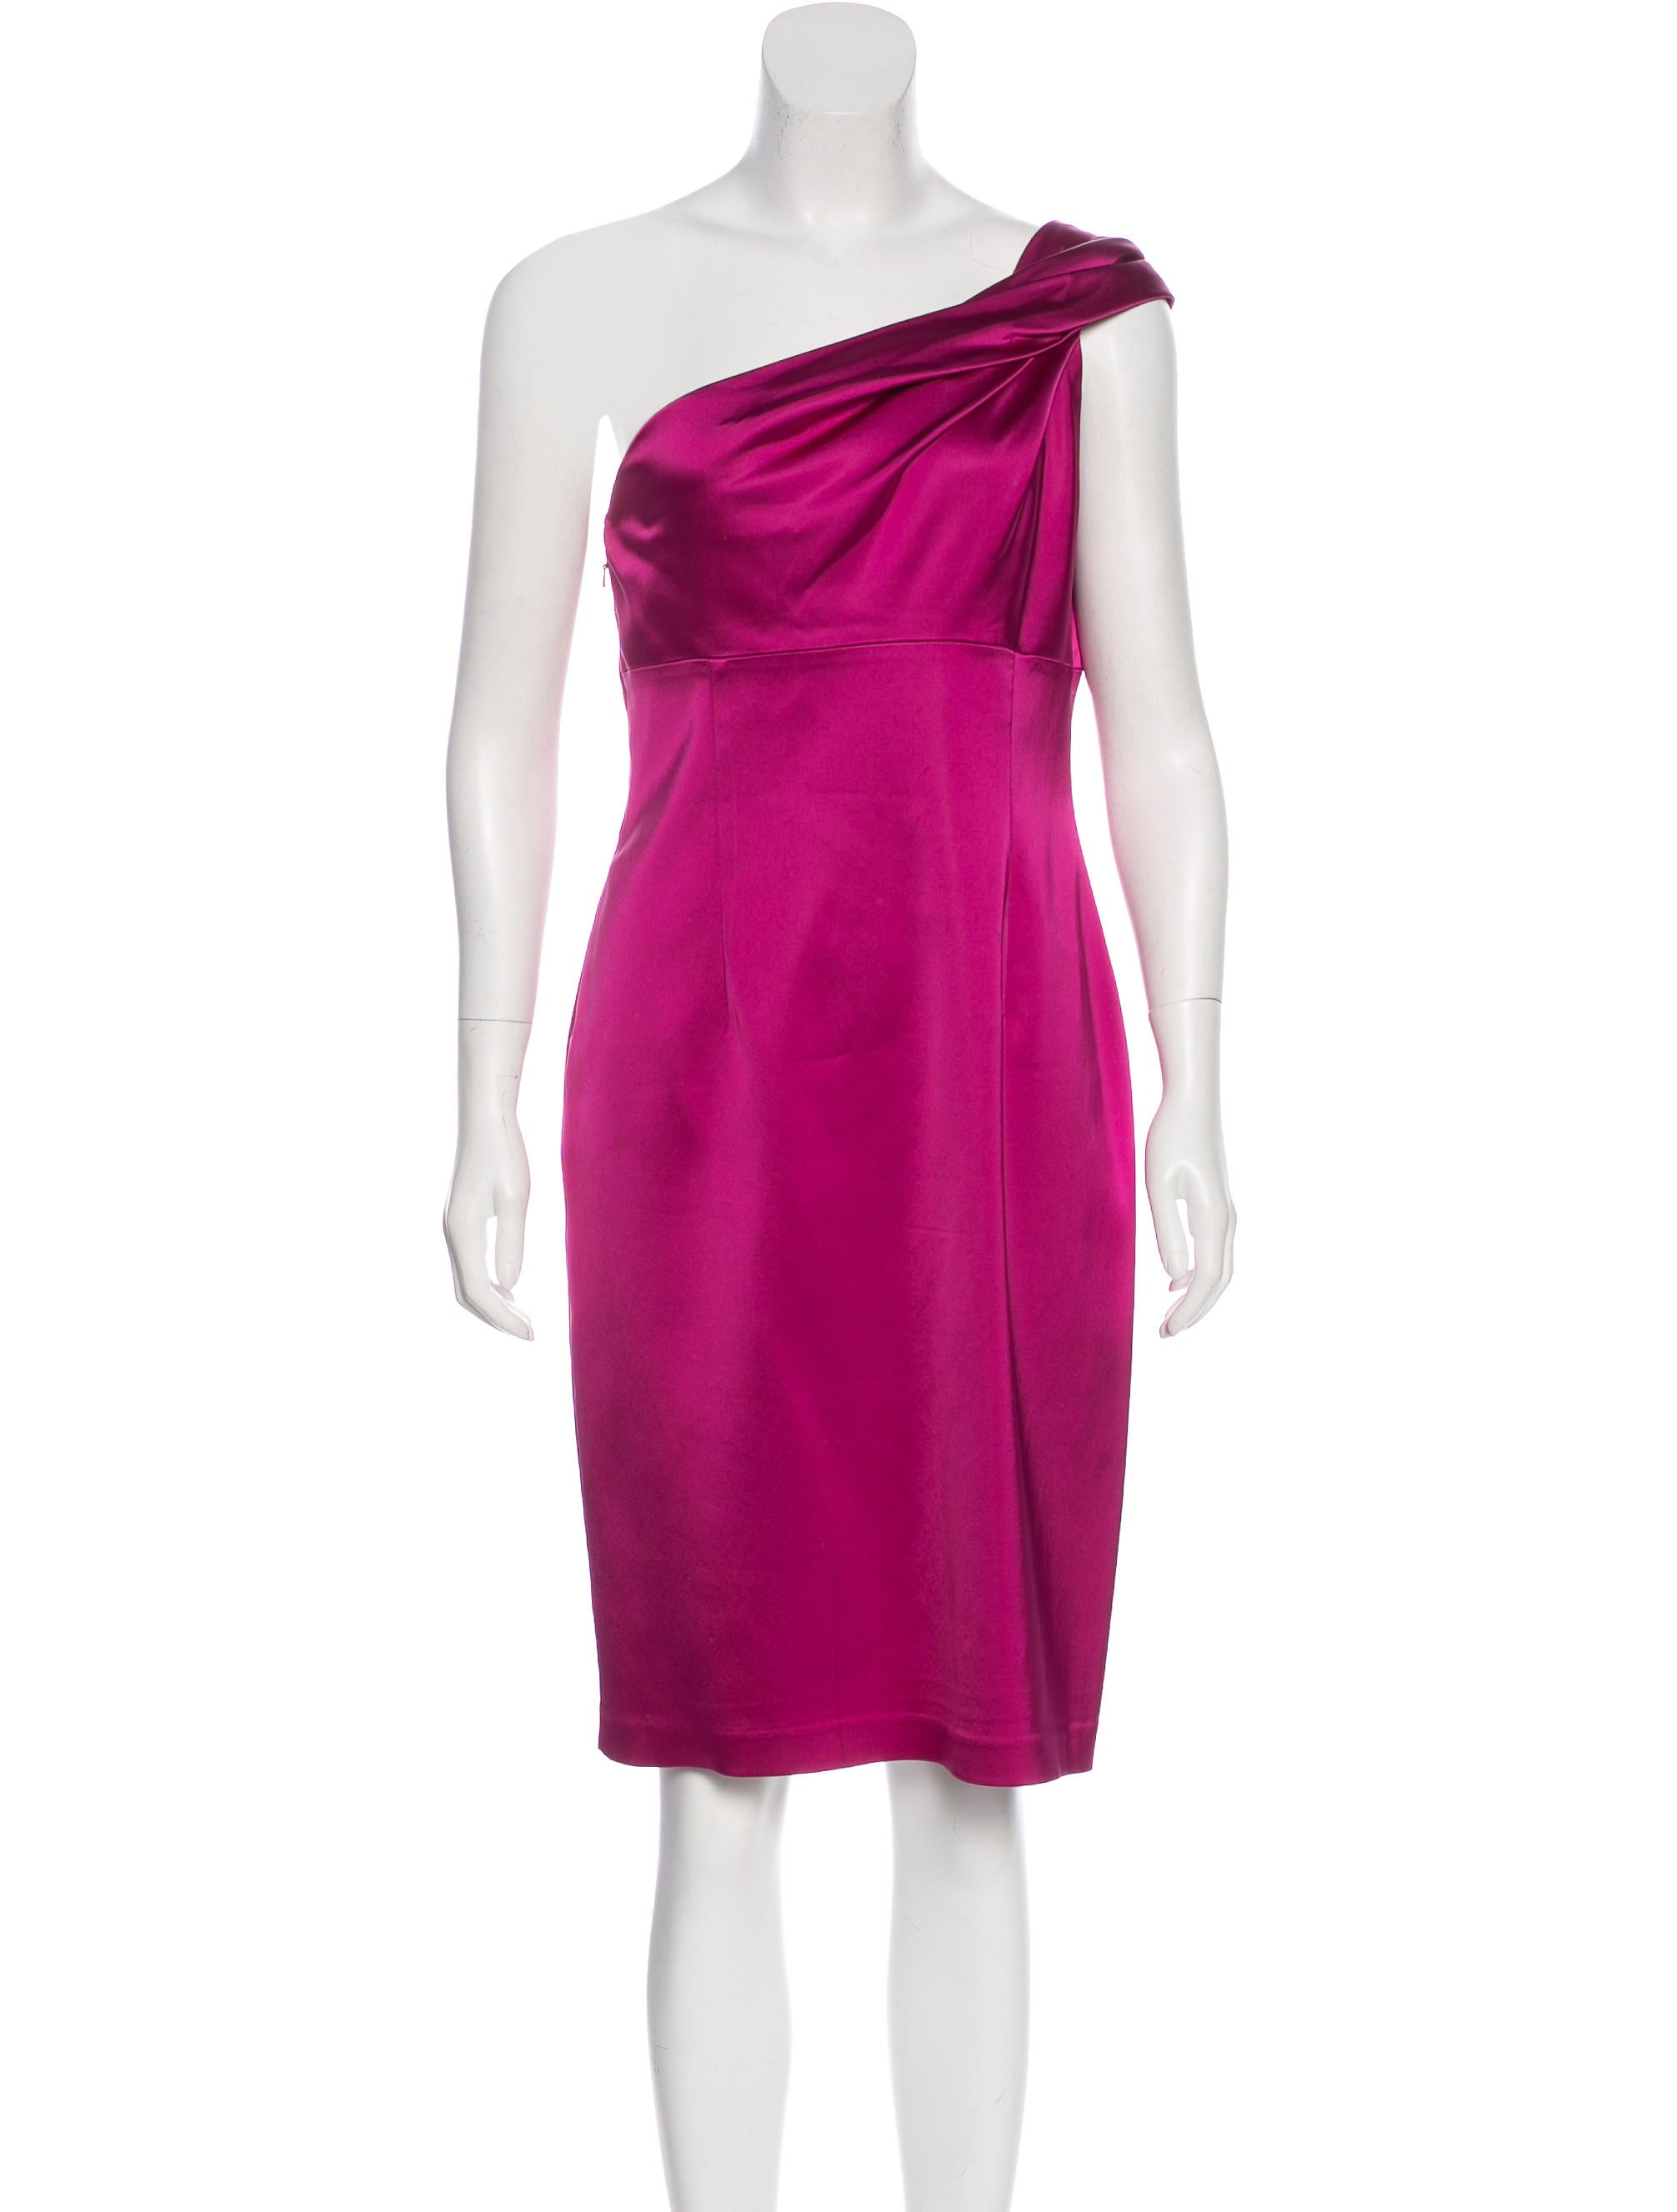 David Meister One-Shoulder Satin Dress - Clothing - WDM25774 | The ...